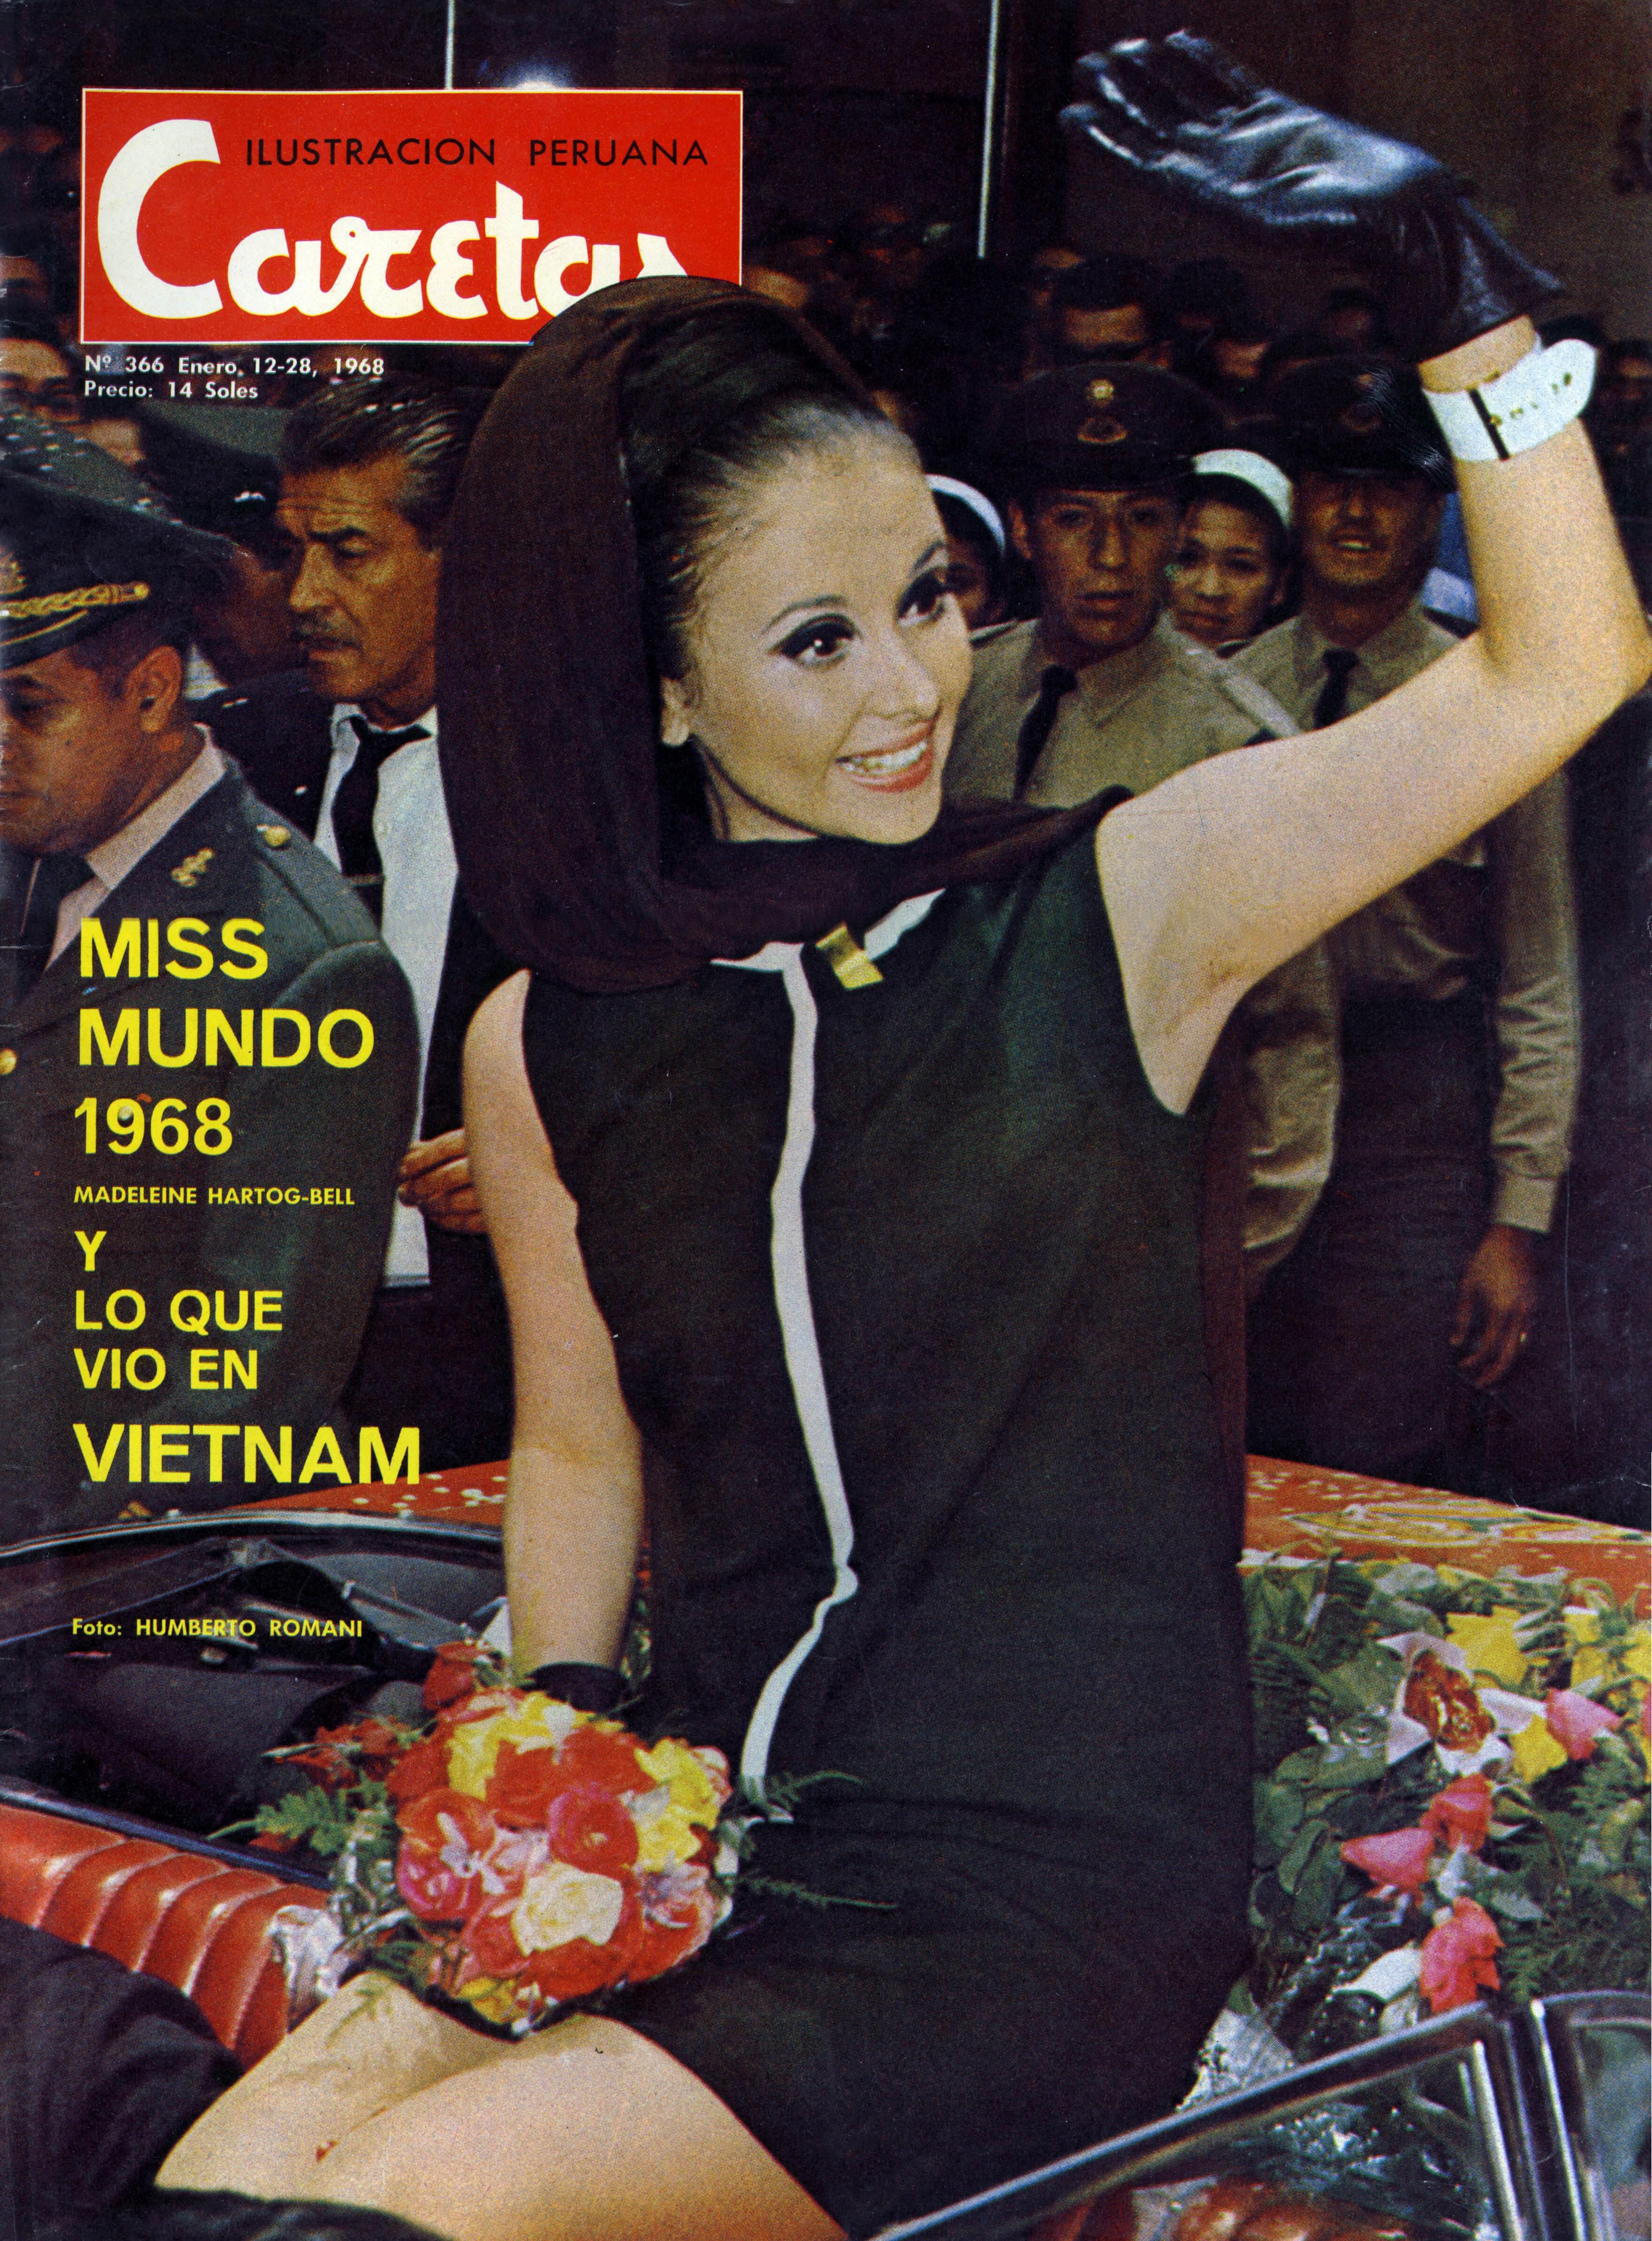 madeleine hartog-bell, primera peruana ser miss world. titulo de miss world 1967. semifinalista de miss universe 1966. Madeleine_Hartog_Bel_paa4